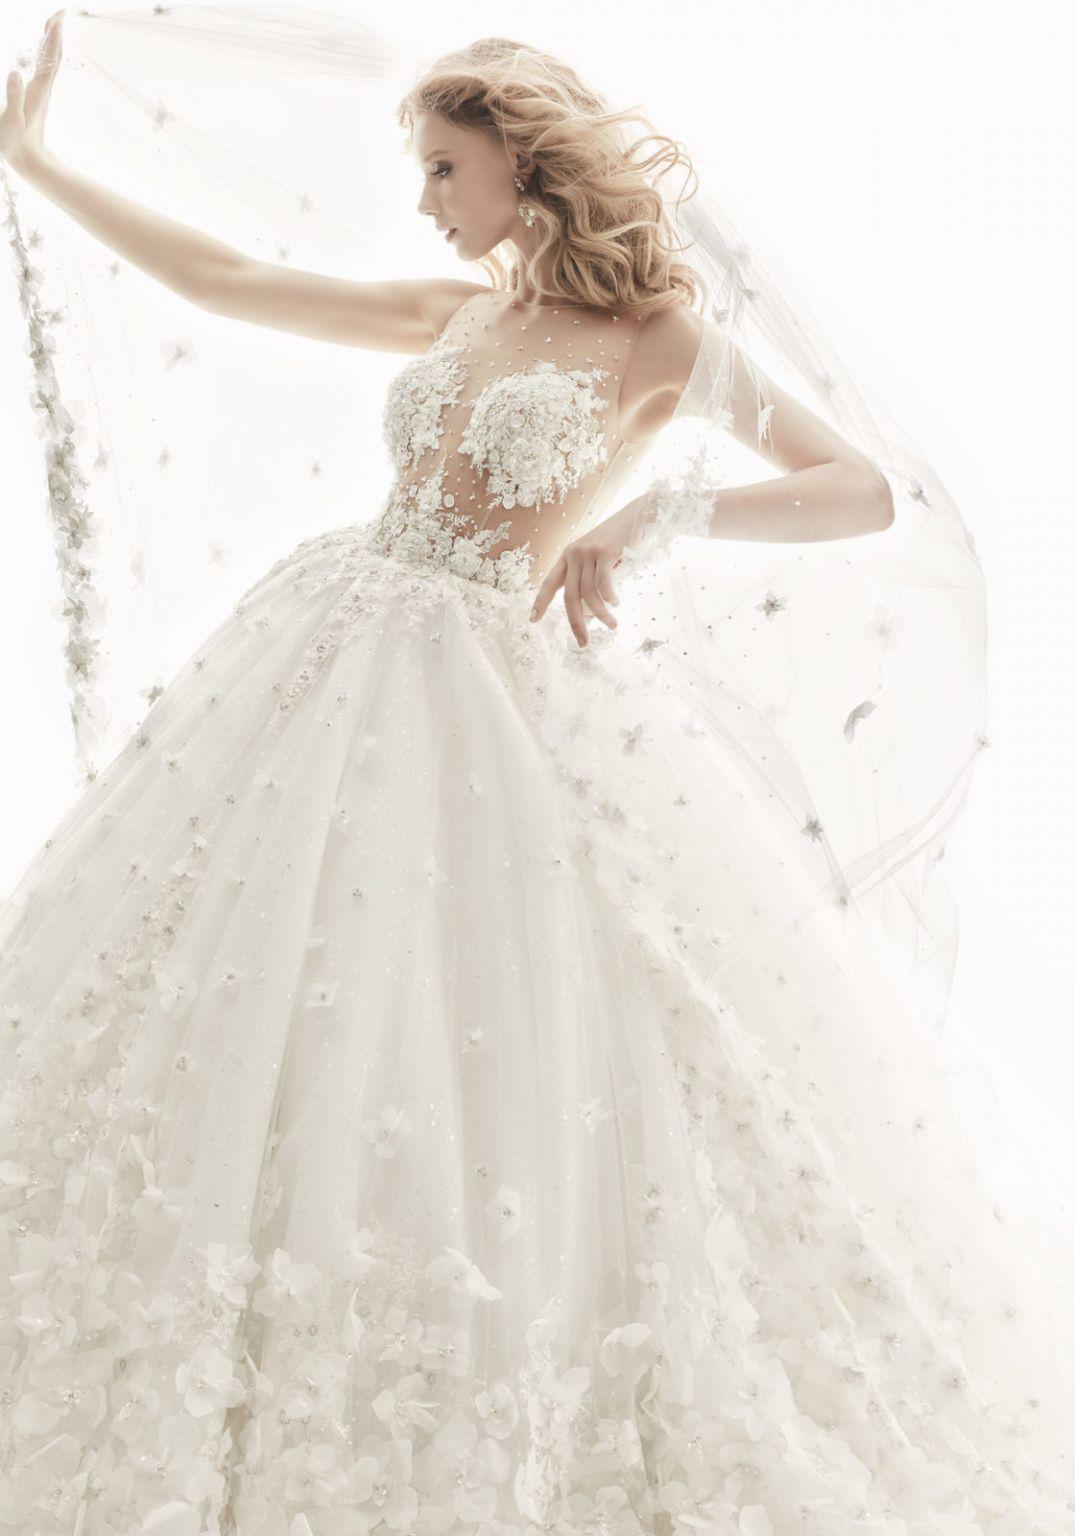 Randy Fenoli Brandi Wedding Dress New Size 4 2 900 Wedding Dresses Wedding Gown Preservation Ball Gown Wedding Dress